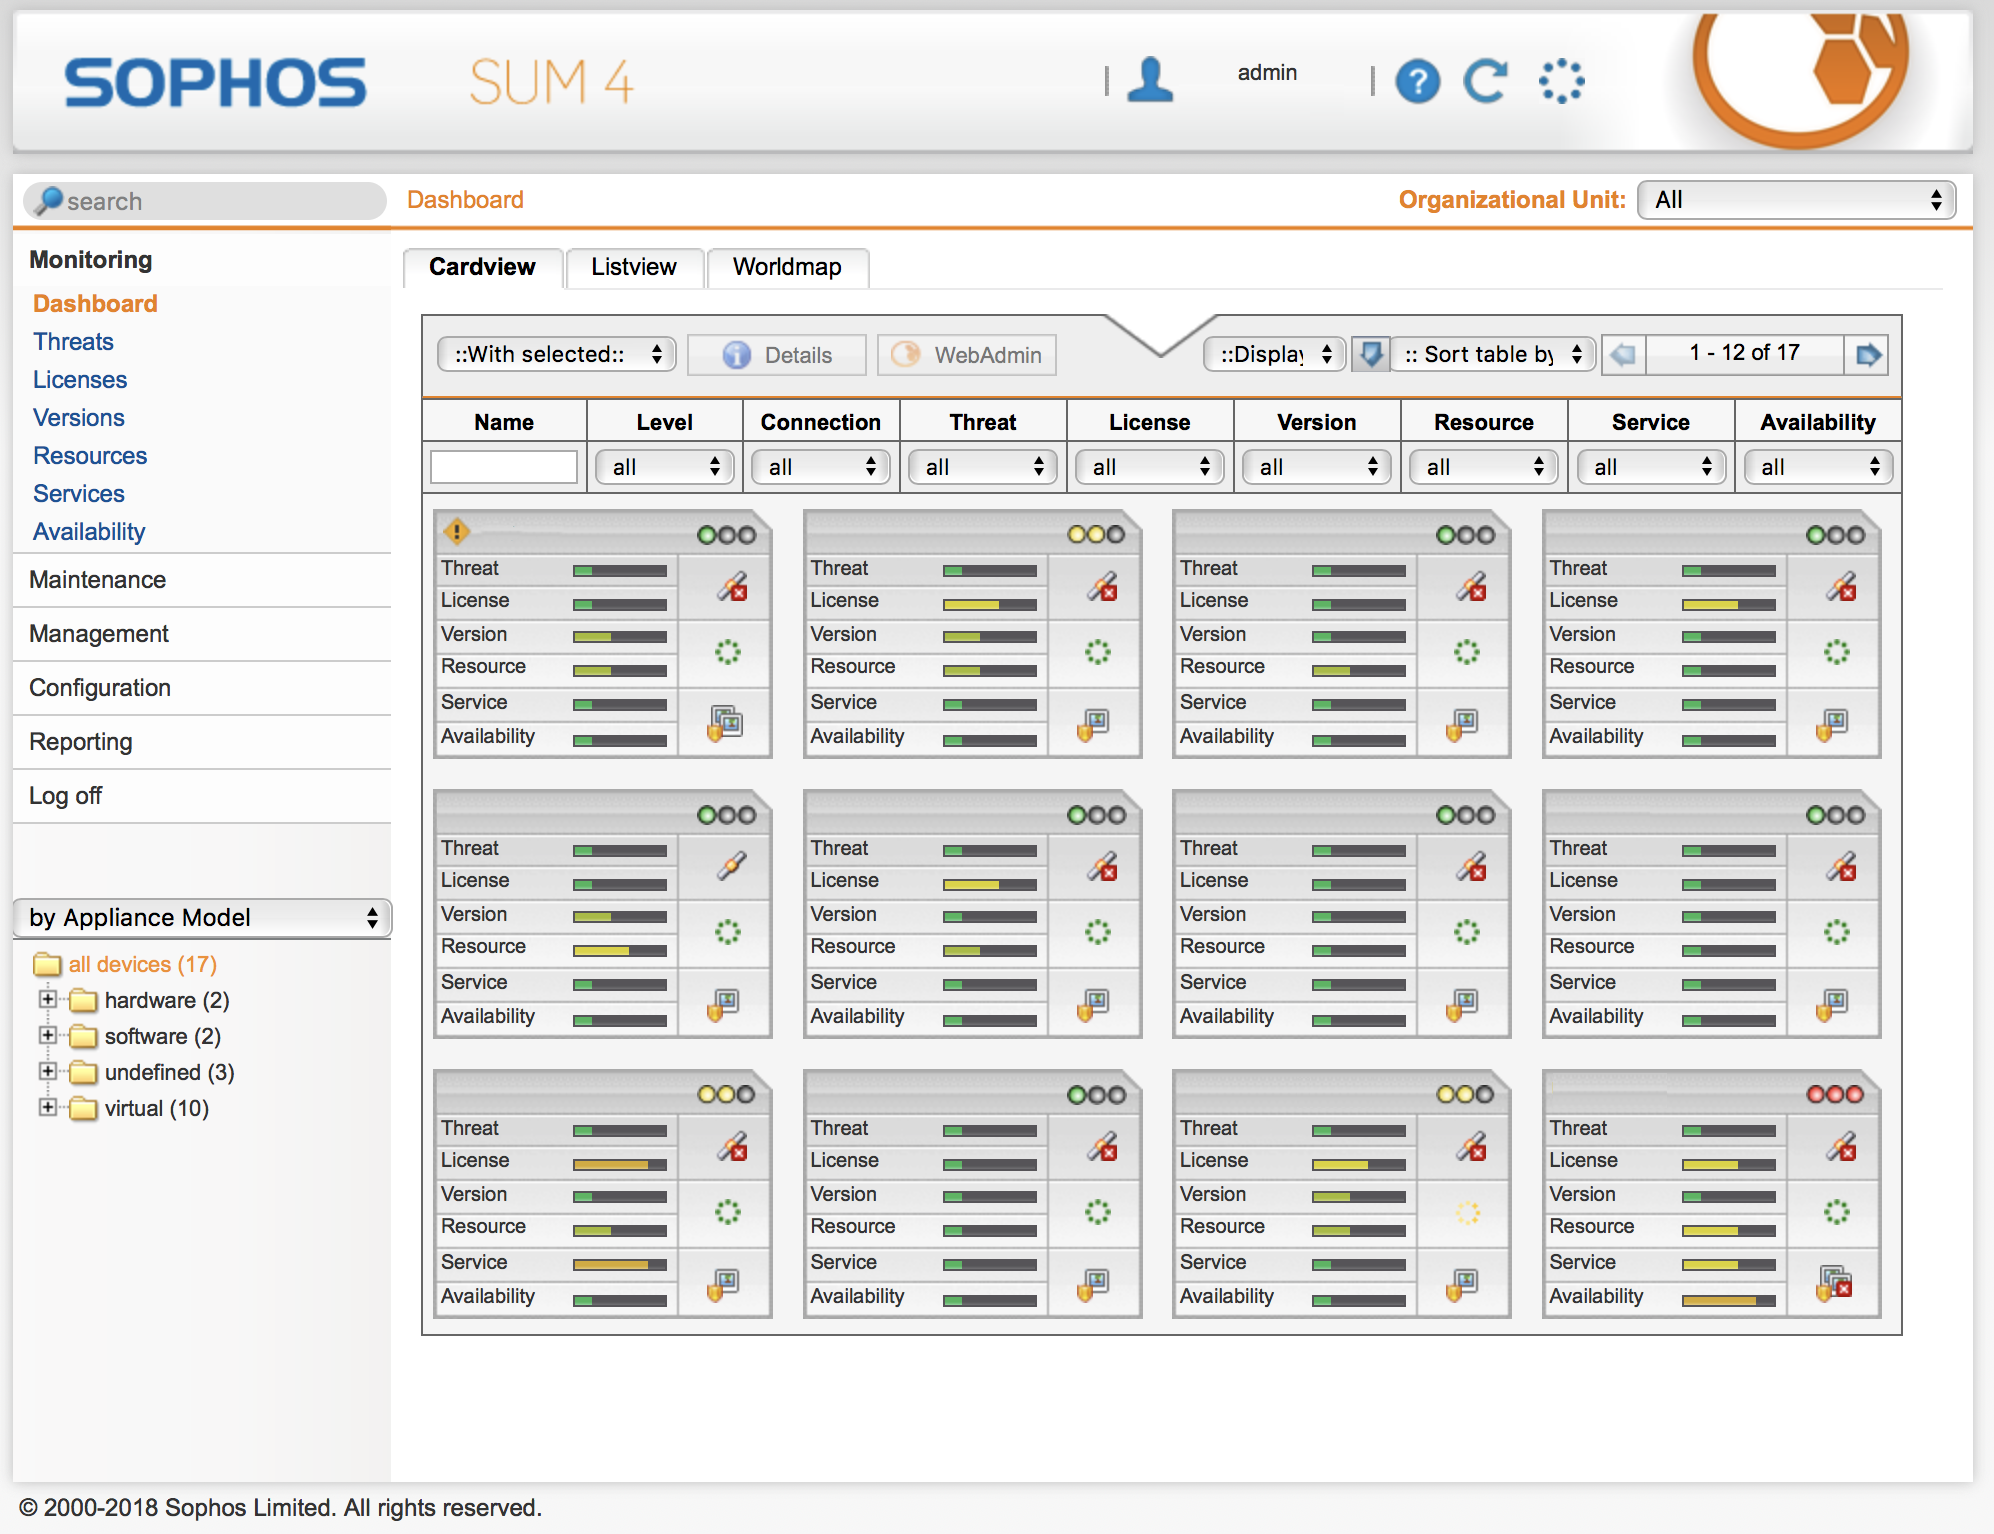 Sophos sum dashboard